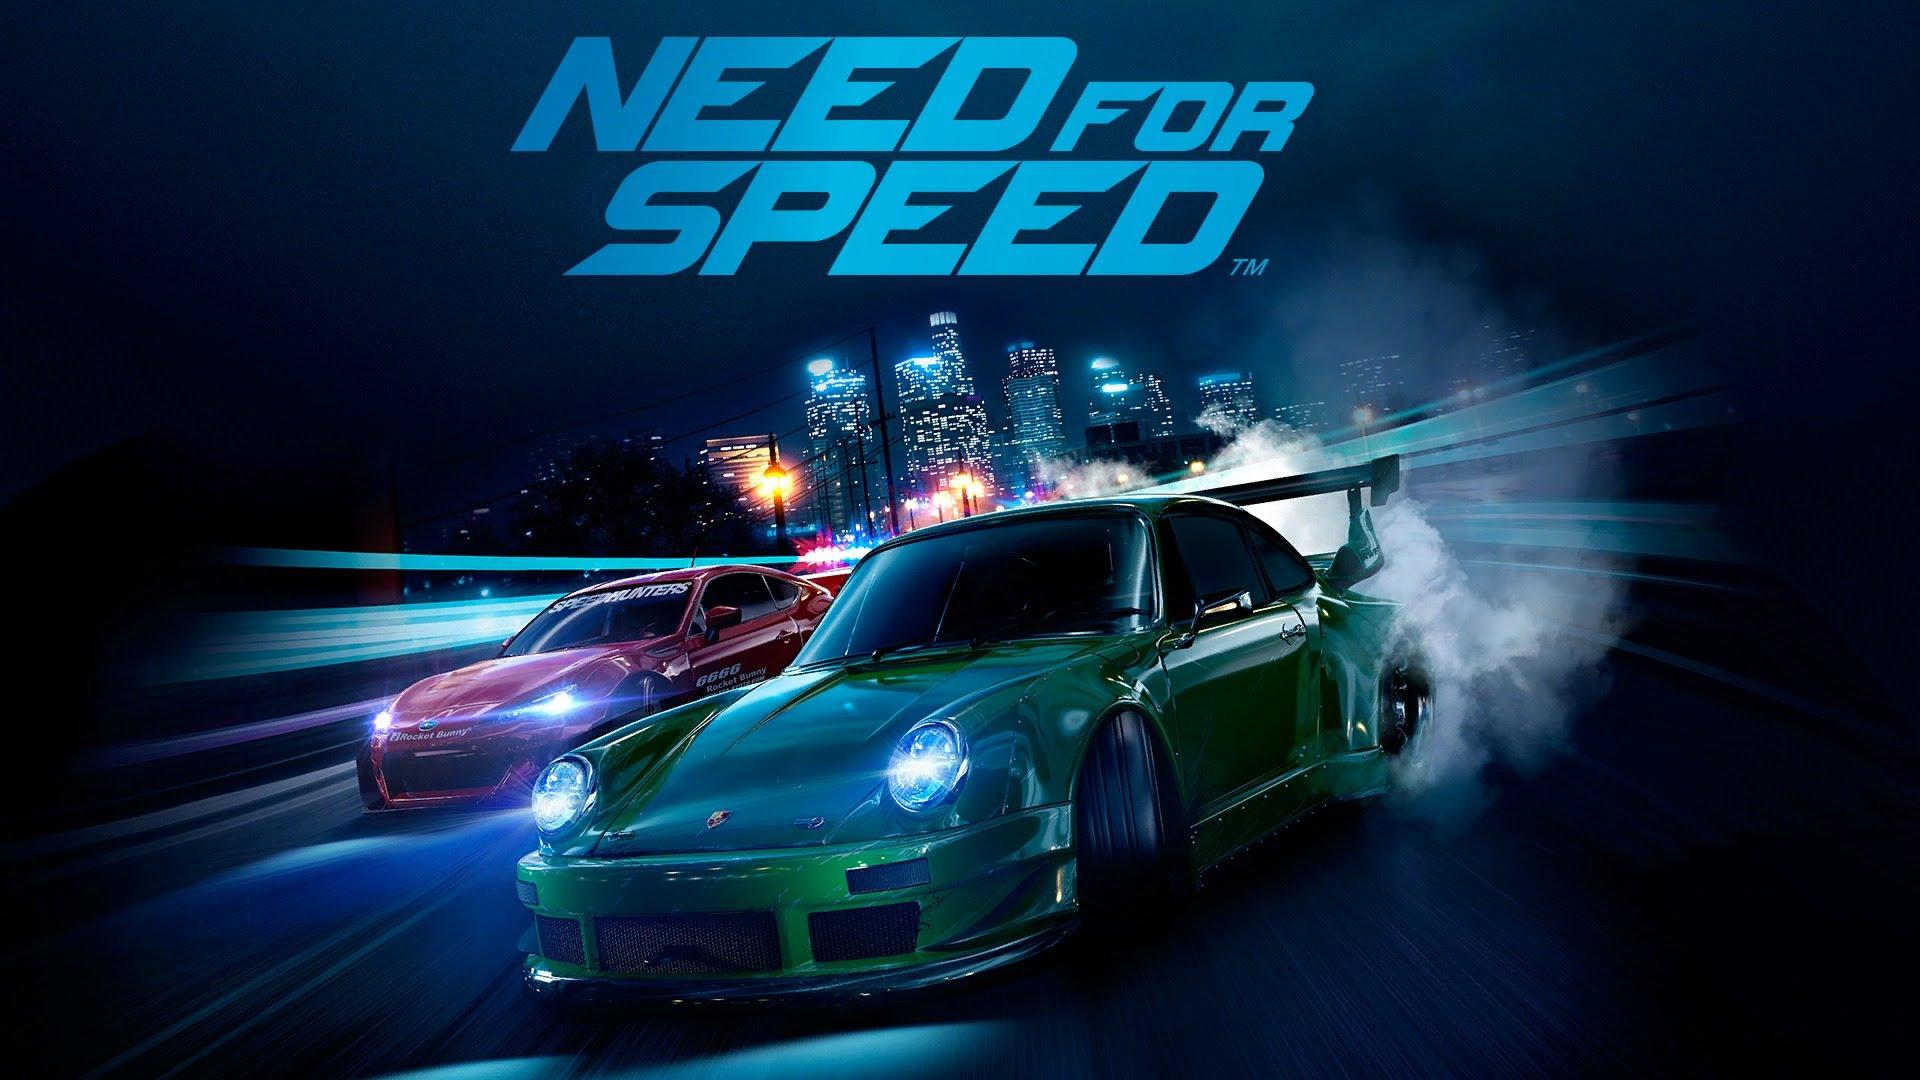 NEED FOR SPEED (Origin cd-key) 2019